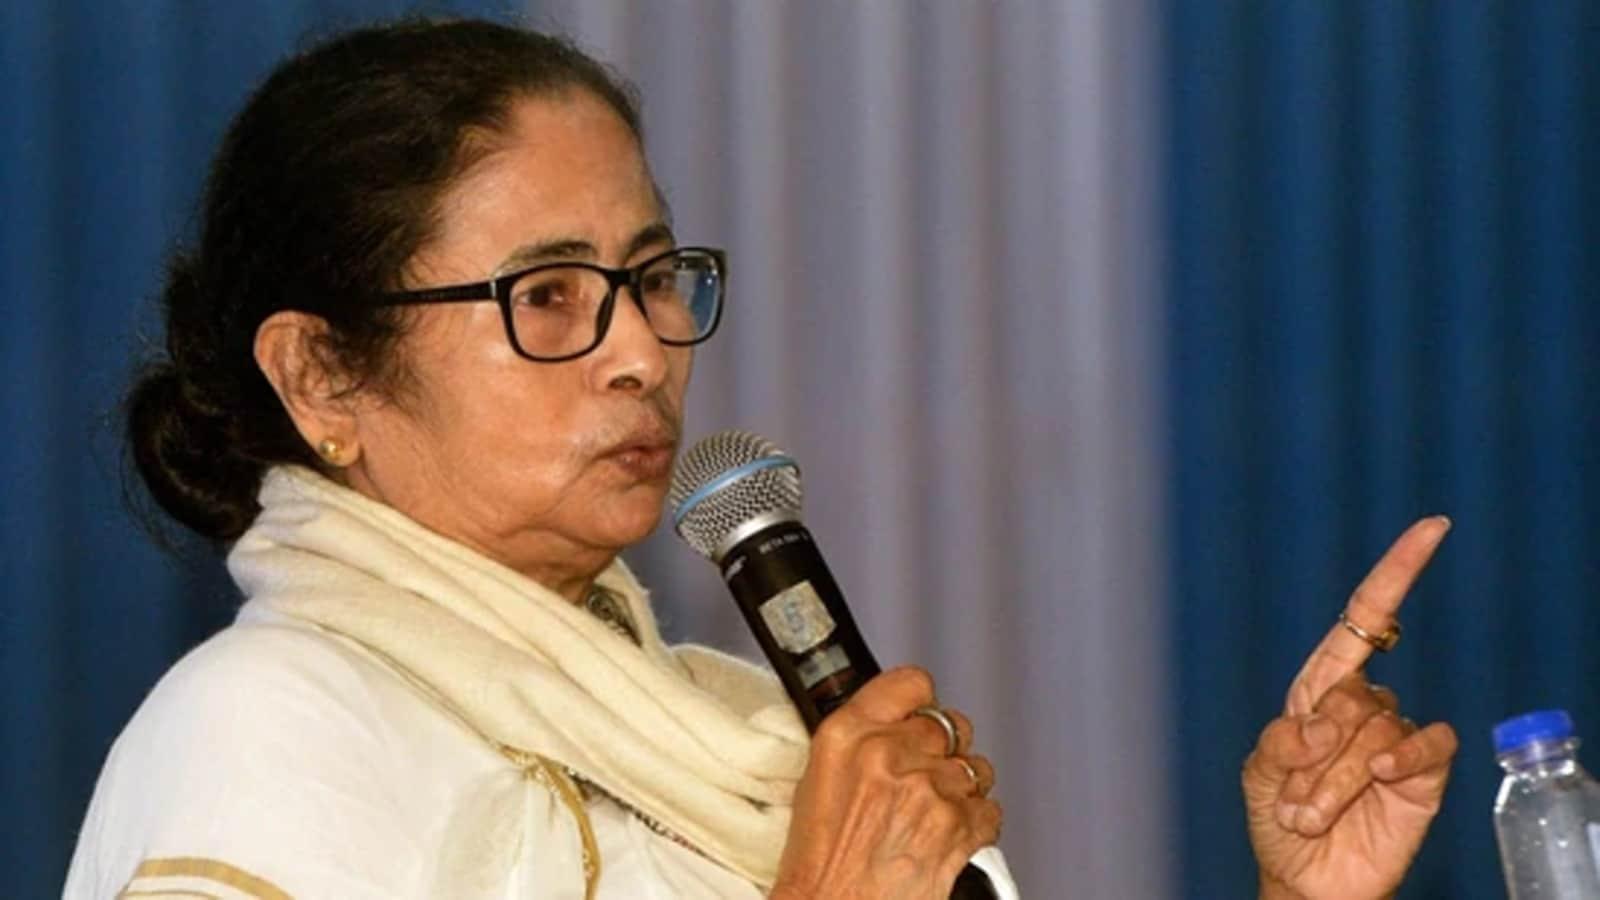 'Prepare to reopen schools, colleges from Nov 16': Banerjee tells officials